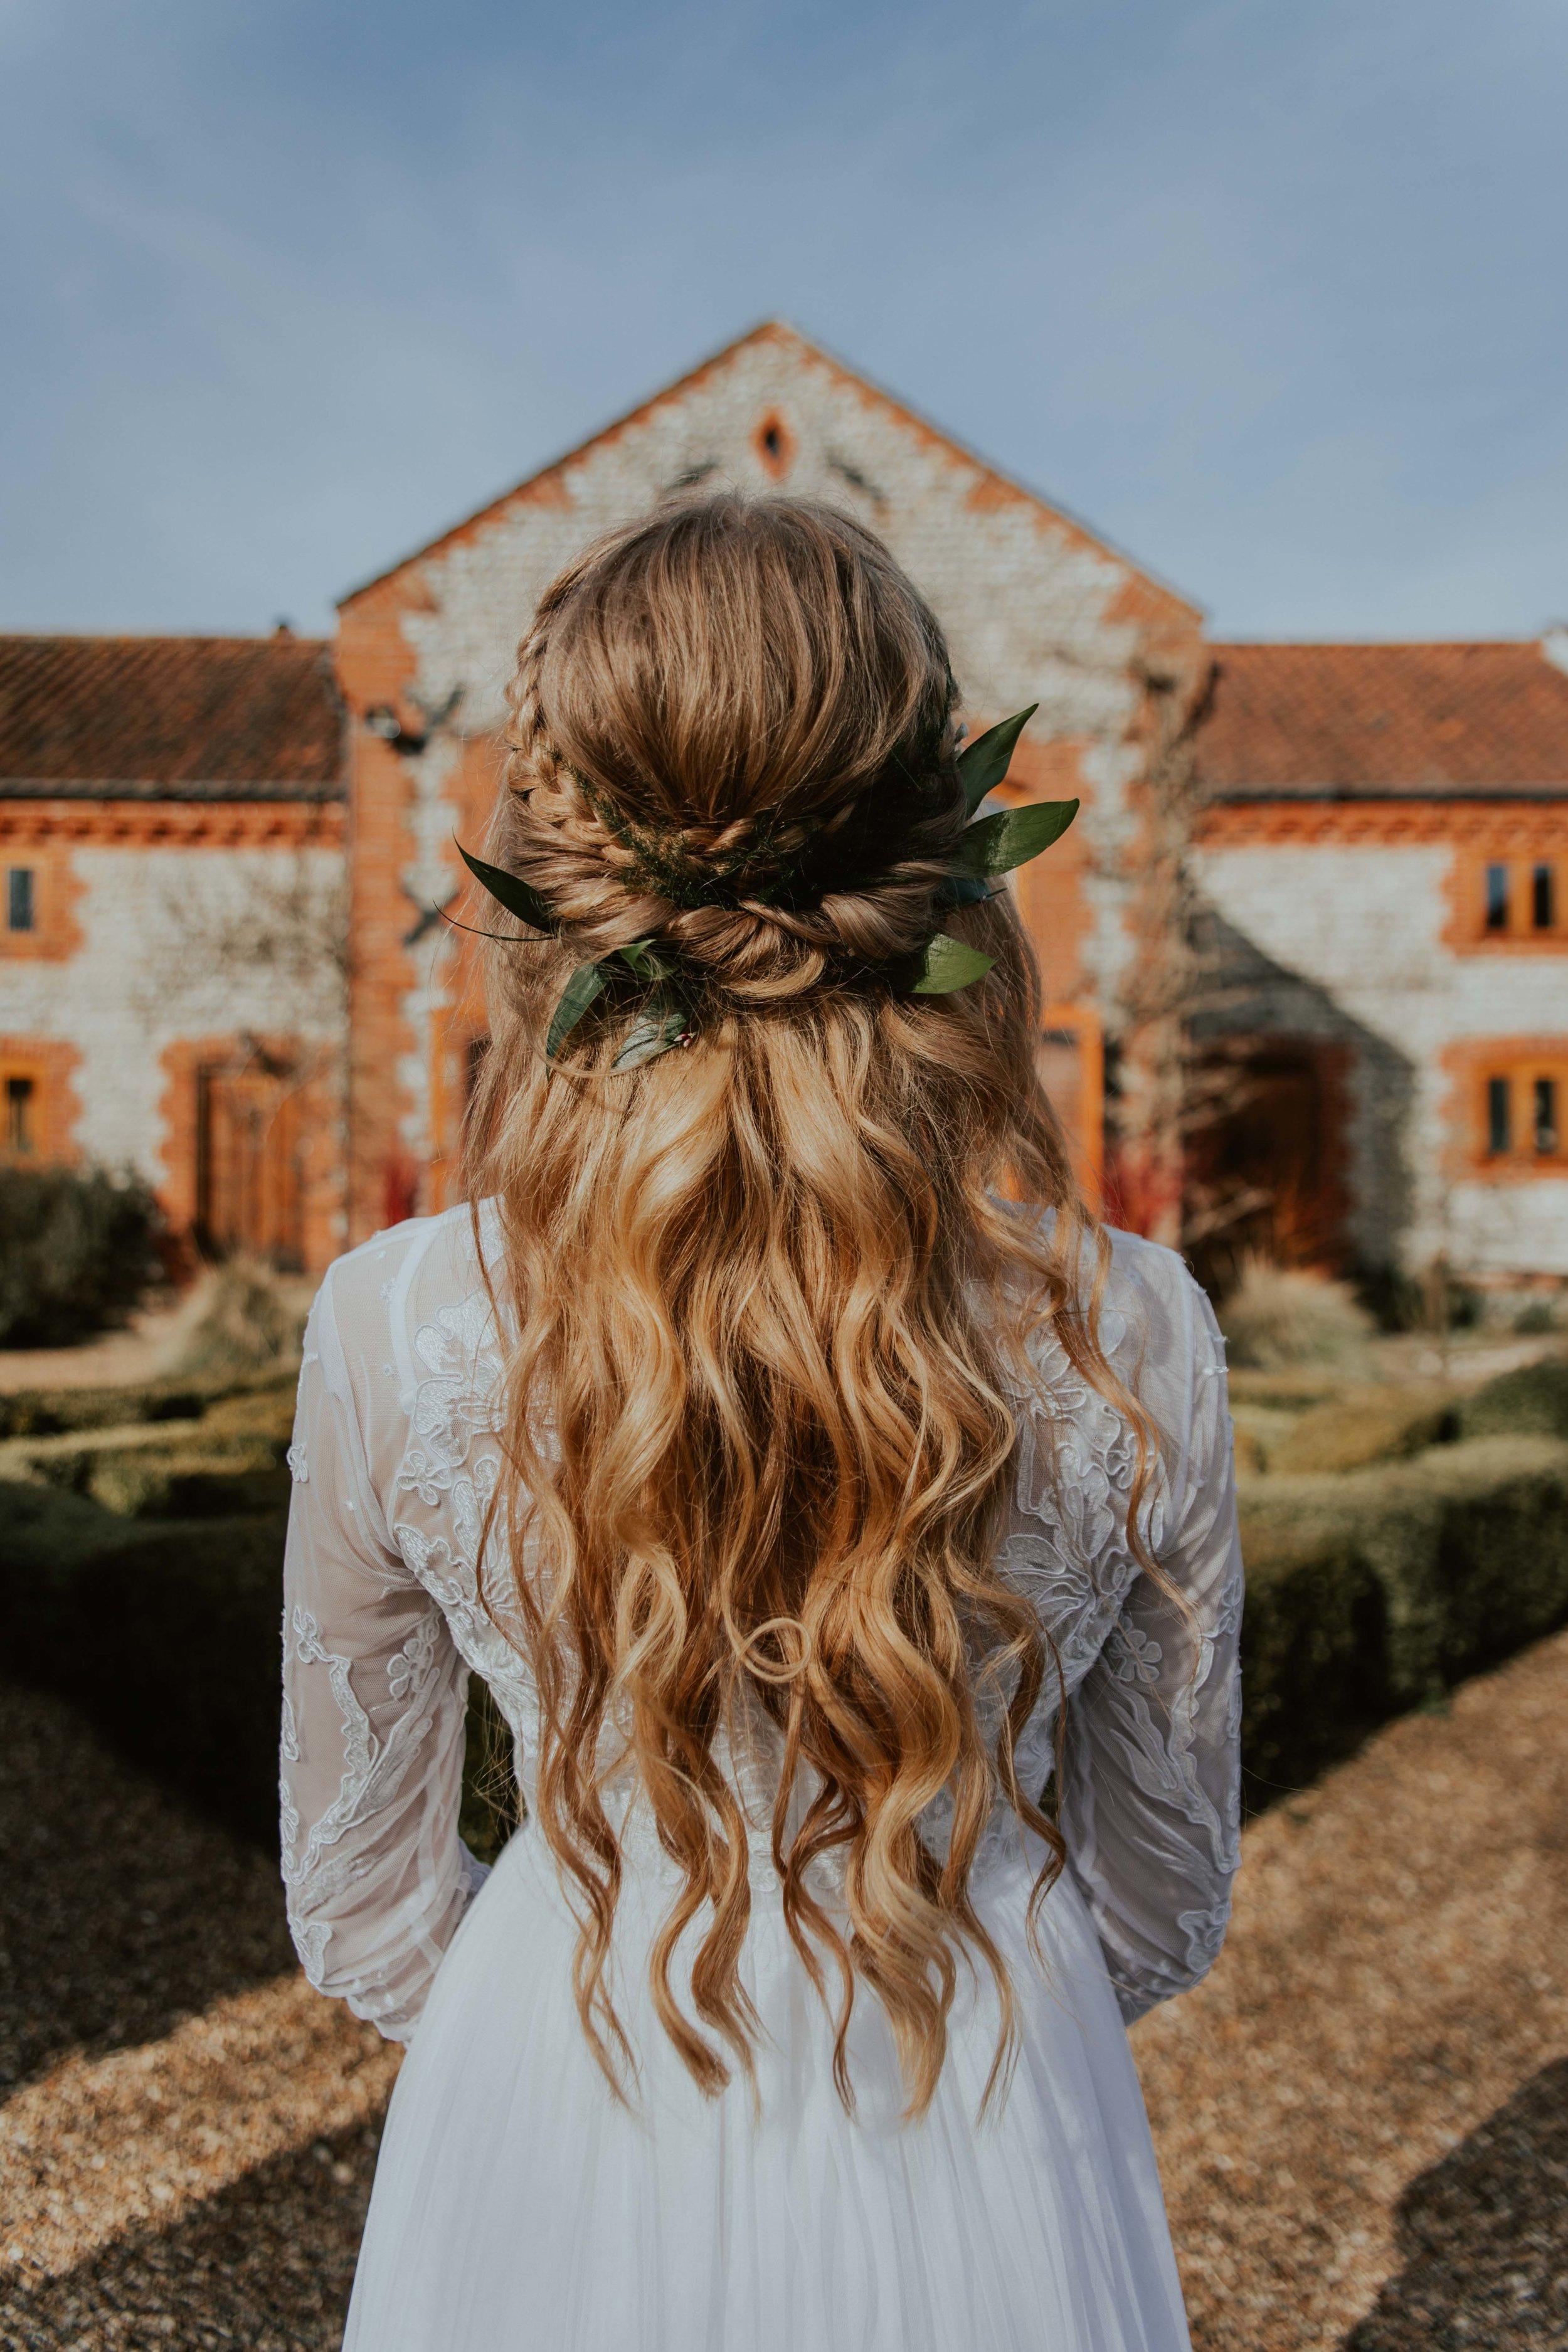 Chaucer Barn, wedding hair norfolk suffolk hair design by lisa